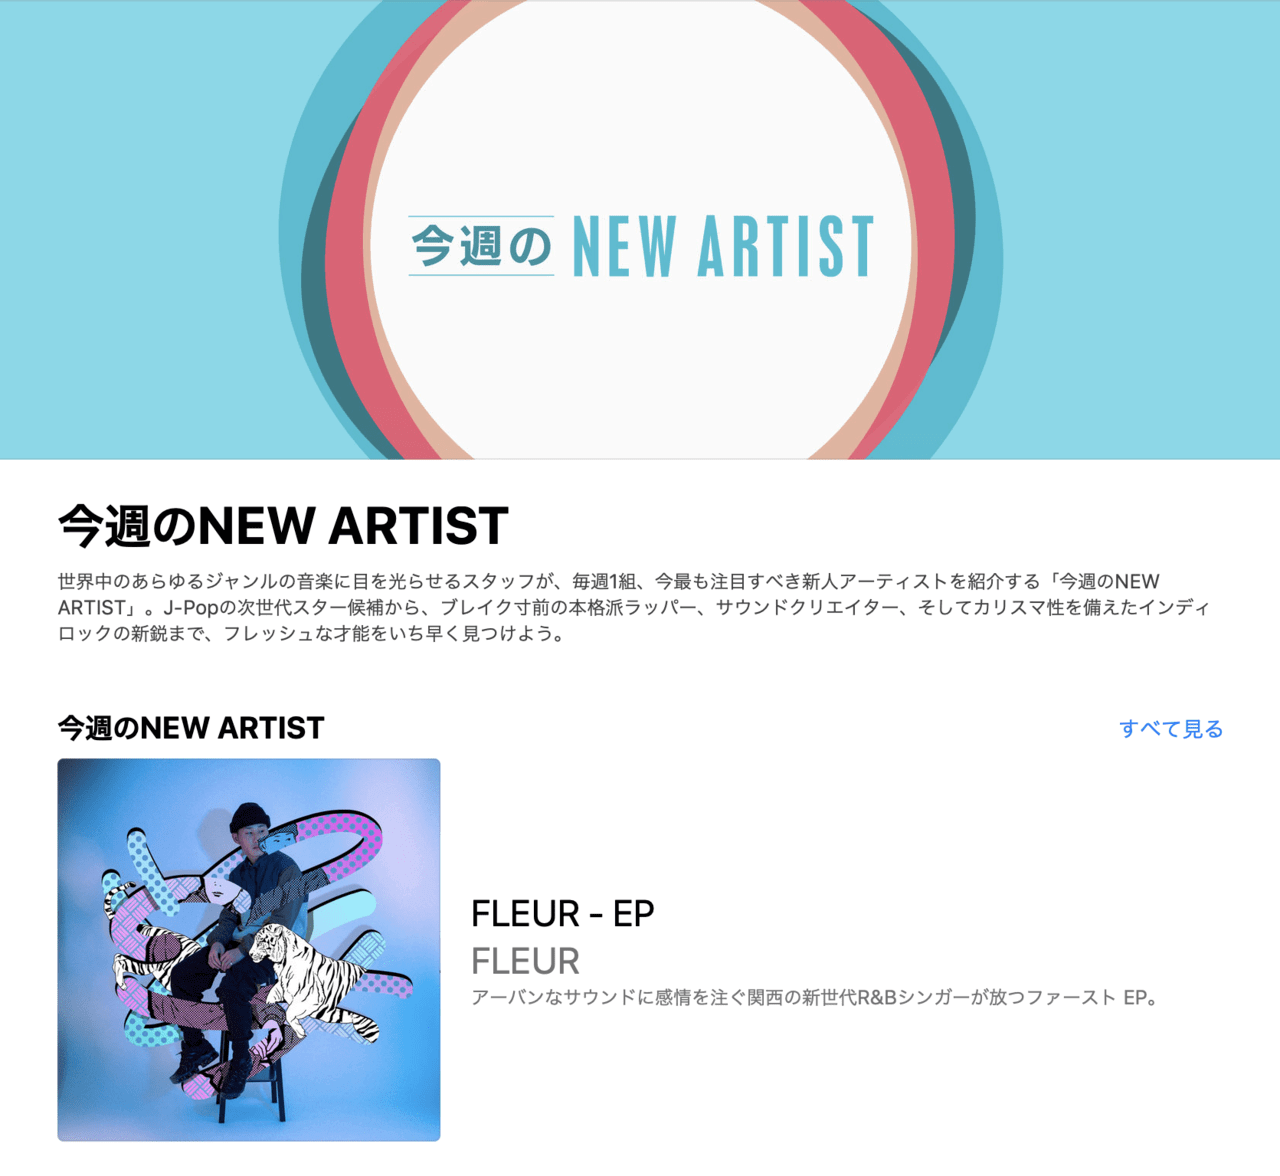 Apple Music「今週のNEW ARTIST」に新鋭シンガーFLEUR (フルール)がピックアップ